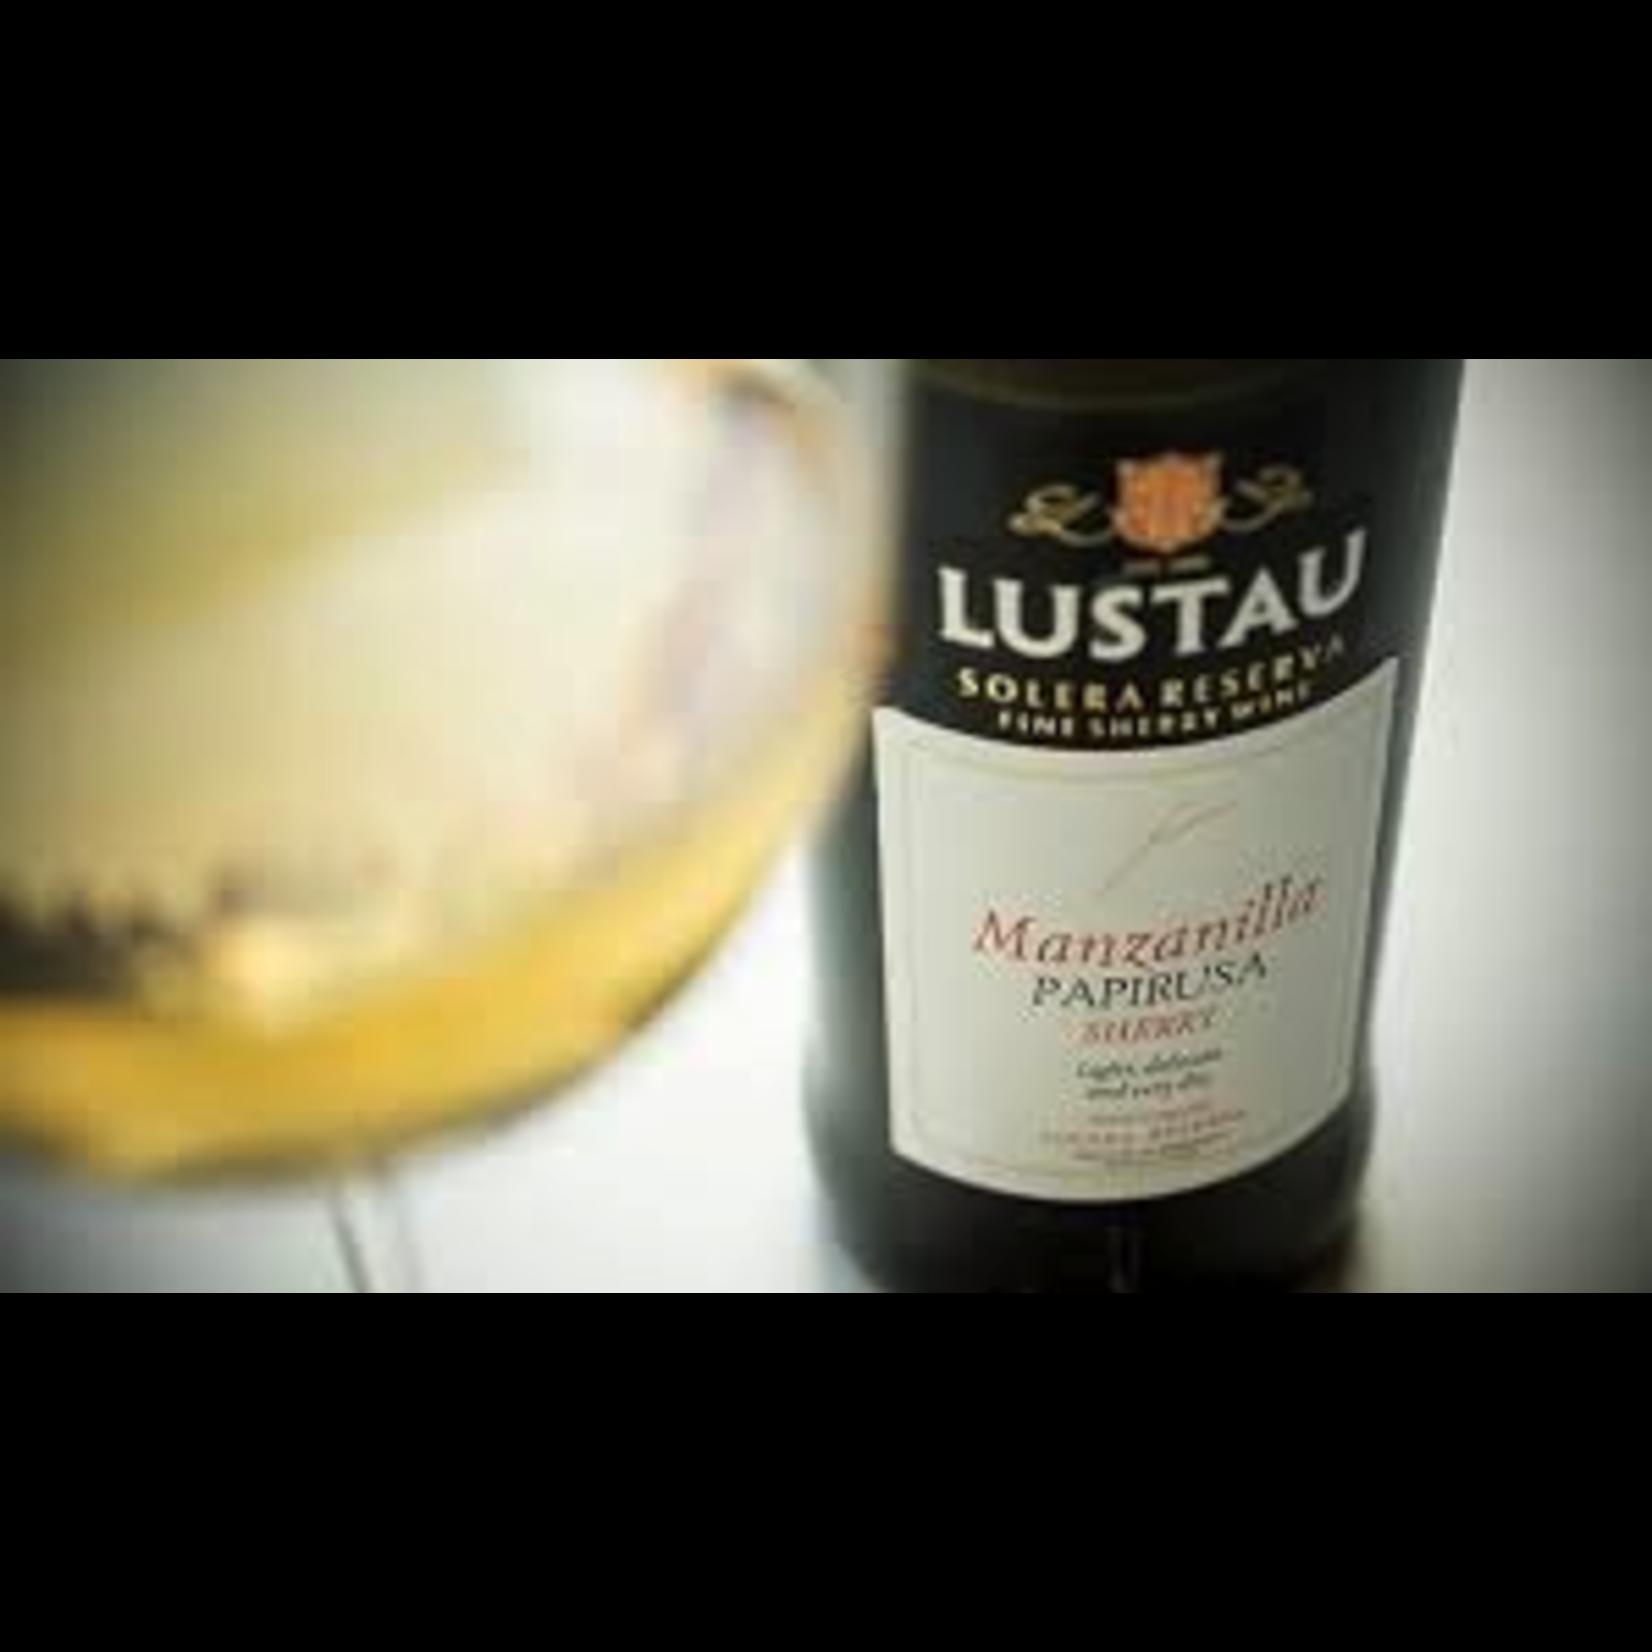 Wine Emilio Lustau Manzanilla Sherry Papirusa